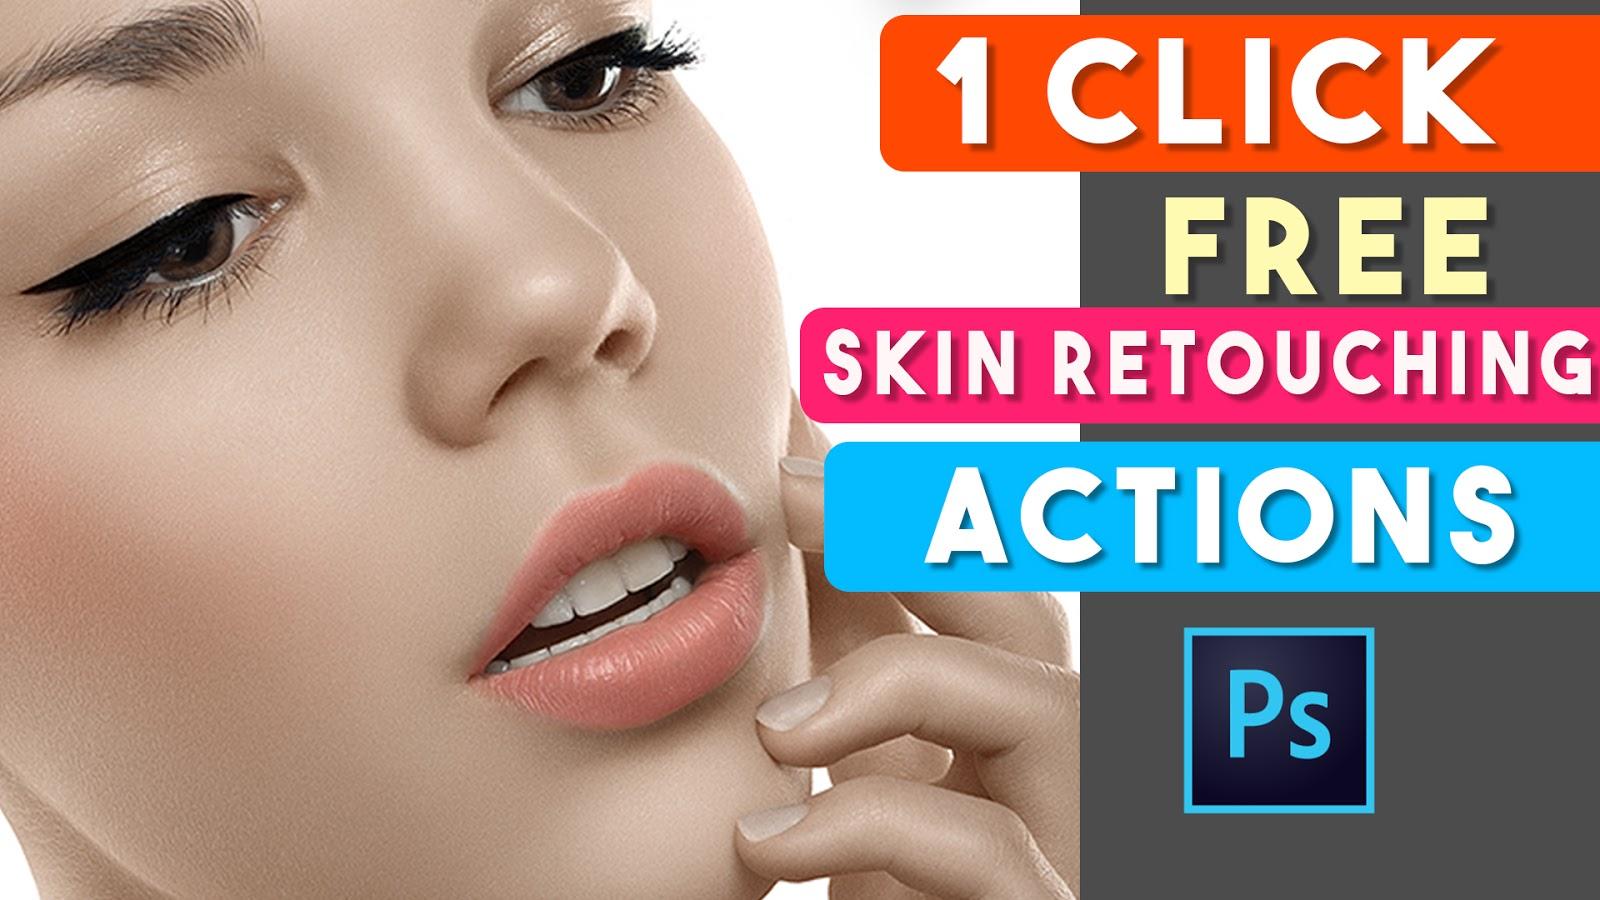 photo editor in photoshop skin retouching free Download